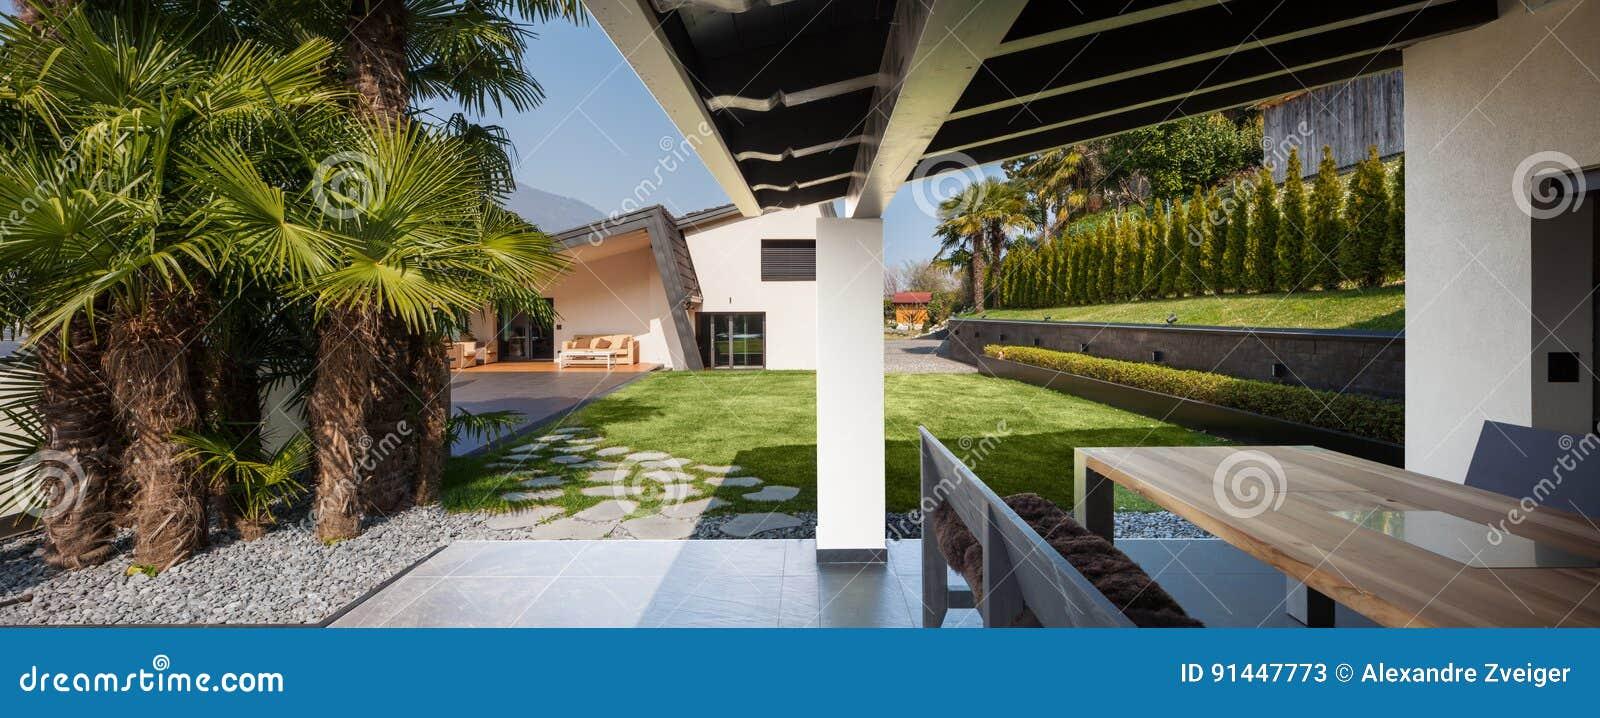 Veranda De Villa Moderne Donnant Sur Le Jardin Image Stock